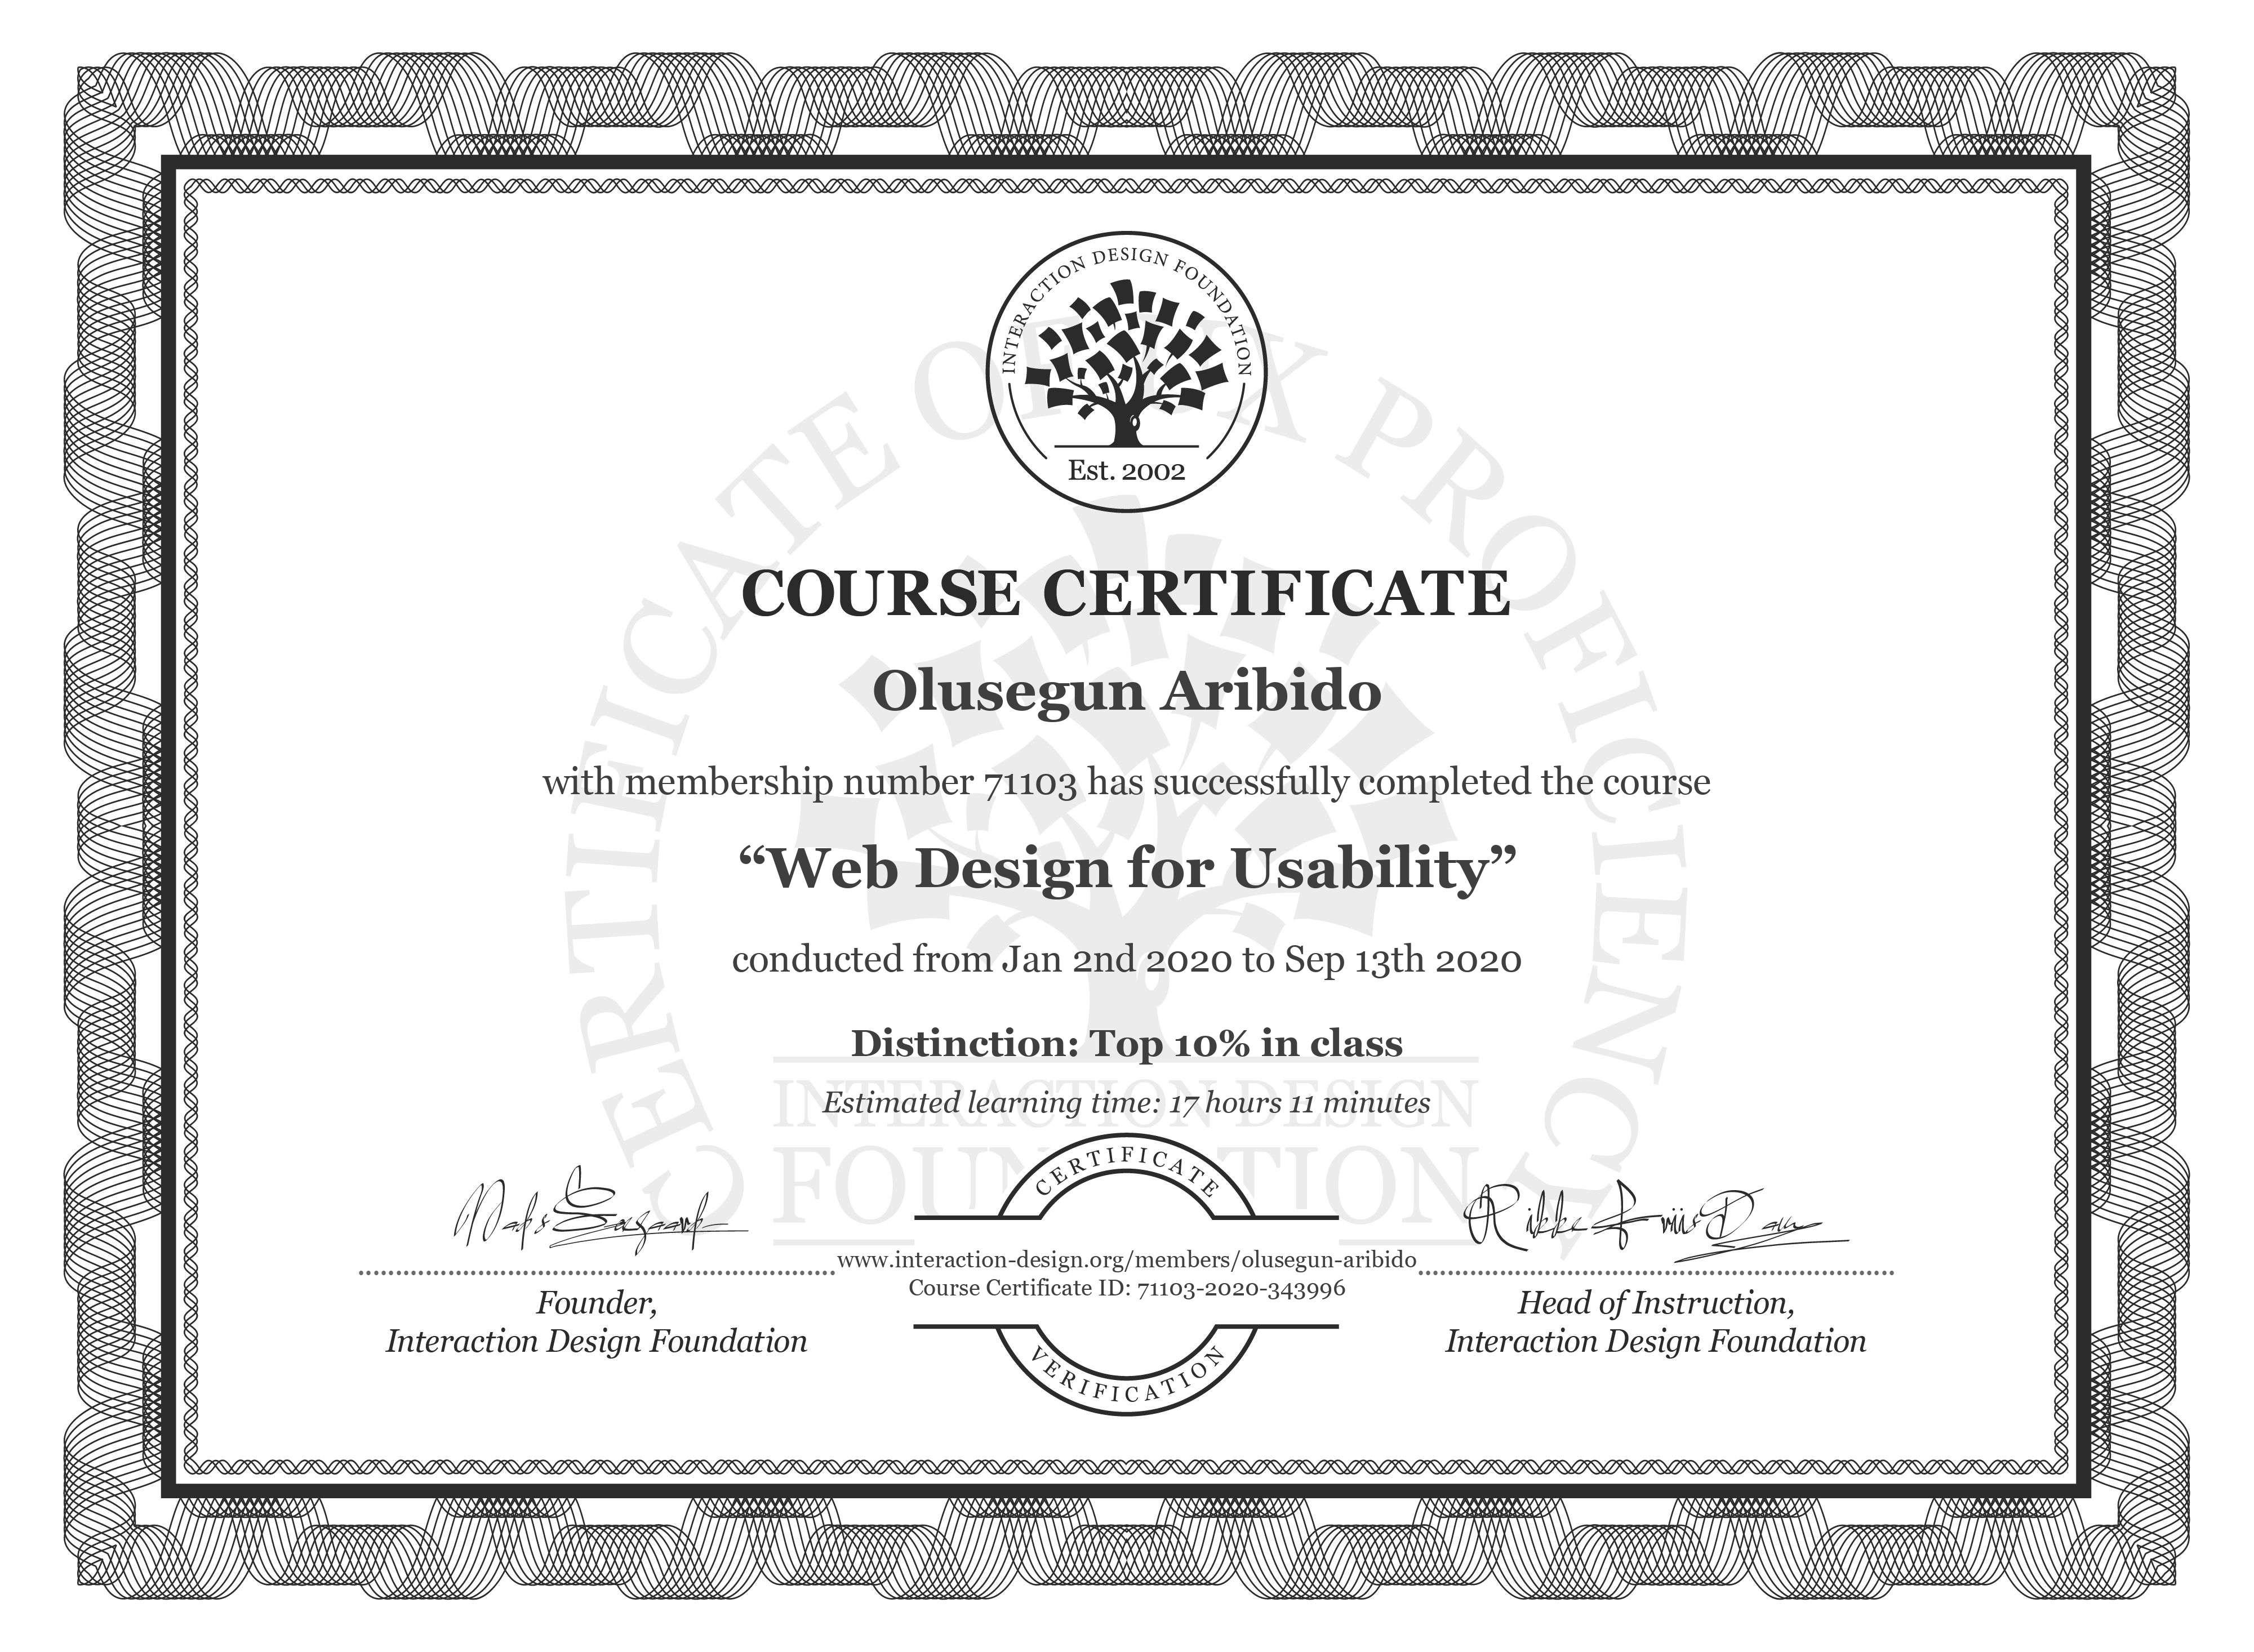 Olusegun Aribido's Course Certificate: Web Design for Usability